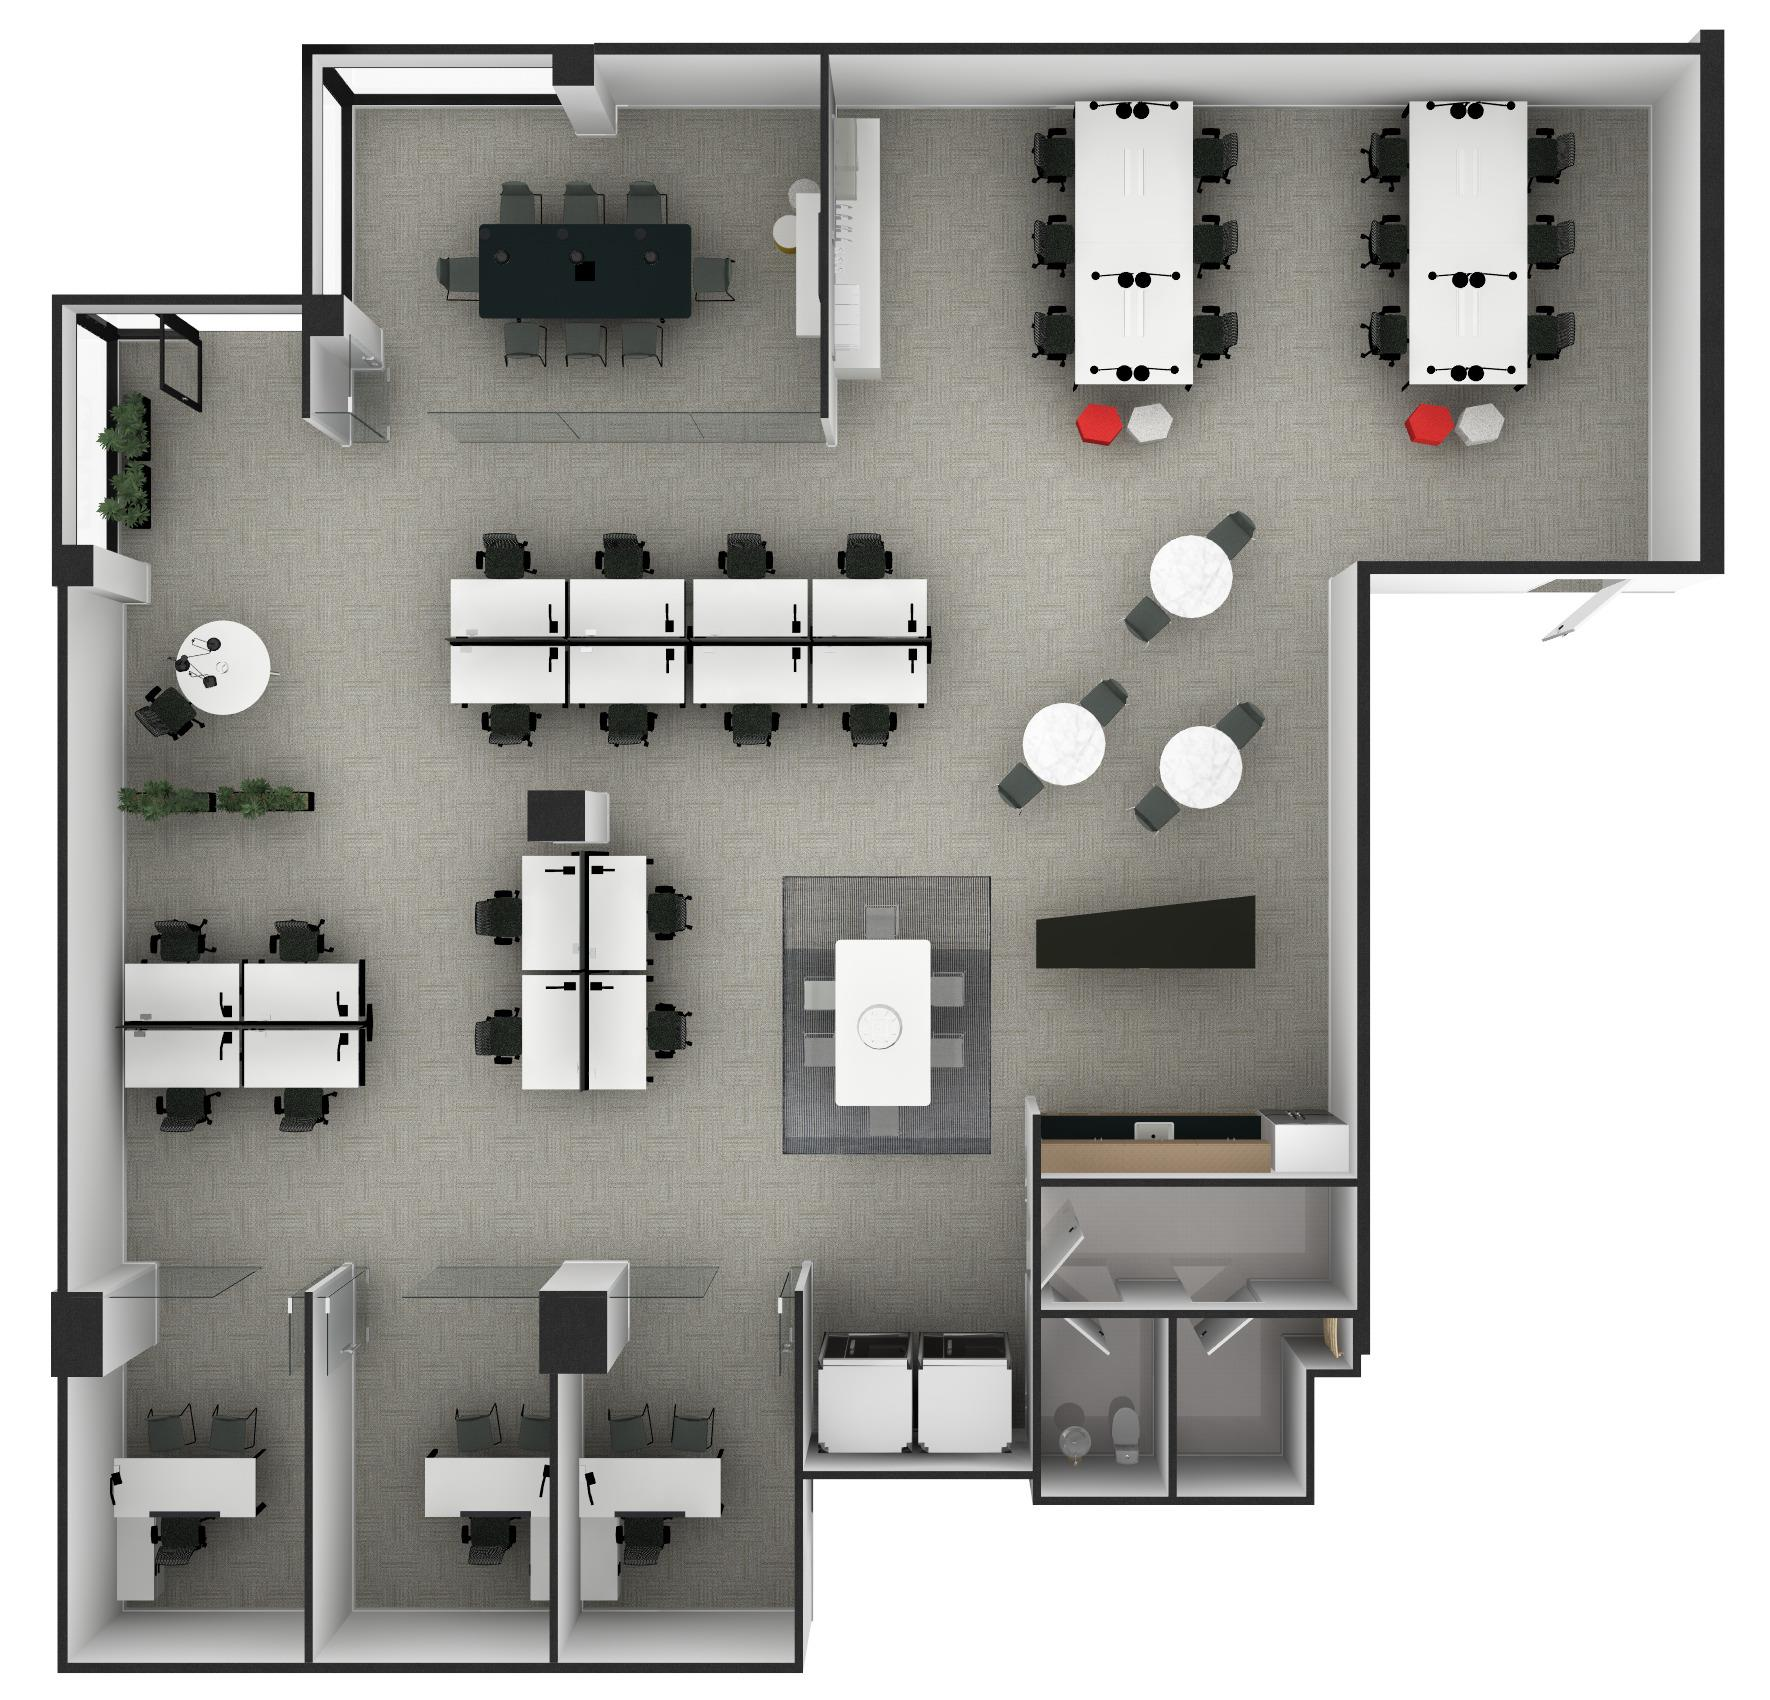 1900 Market Street | Brandywine - Suite 120 - altSpace